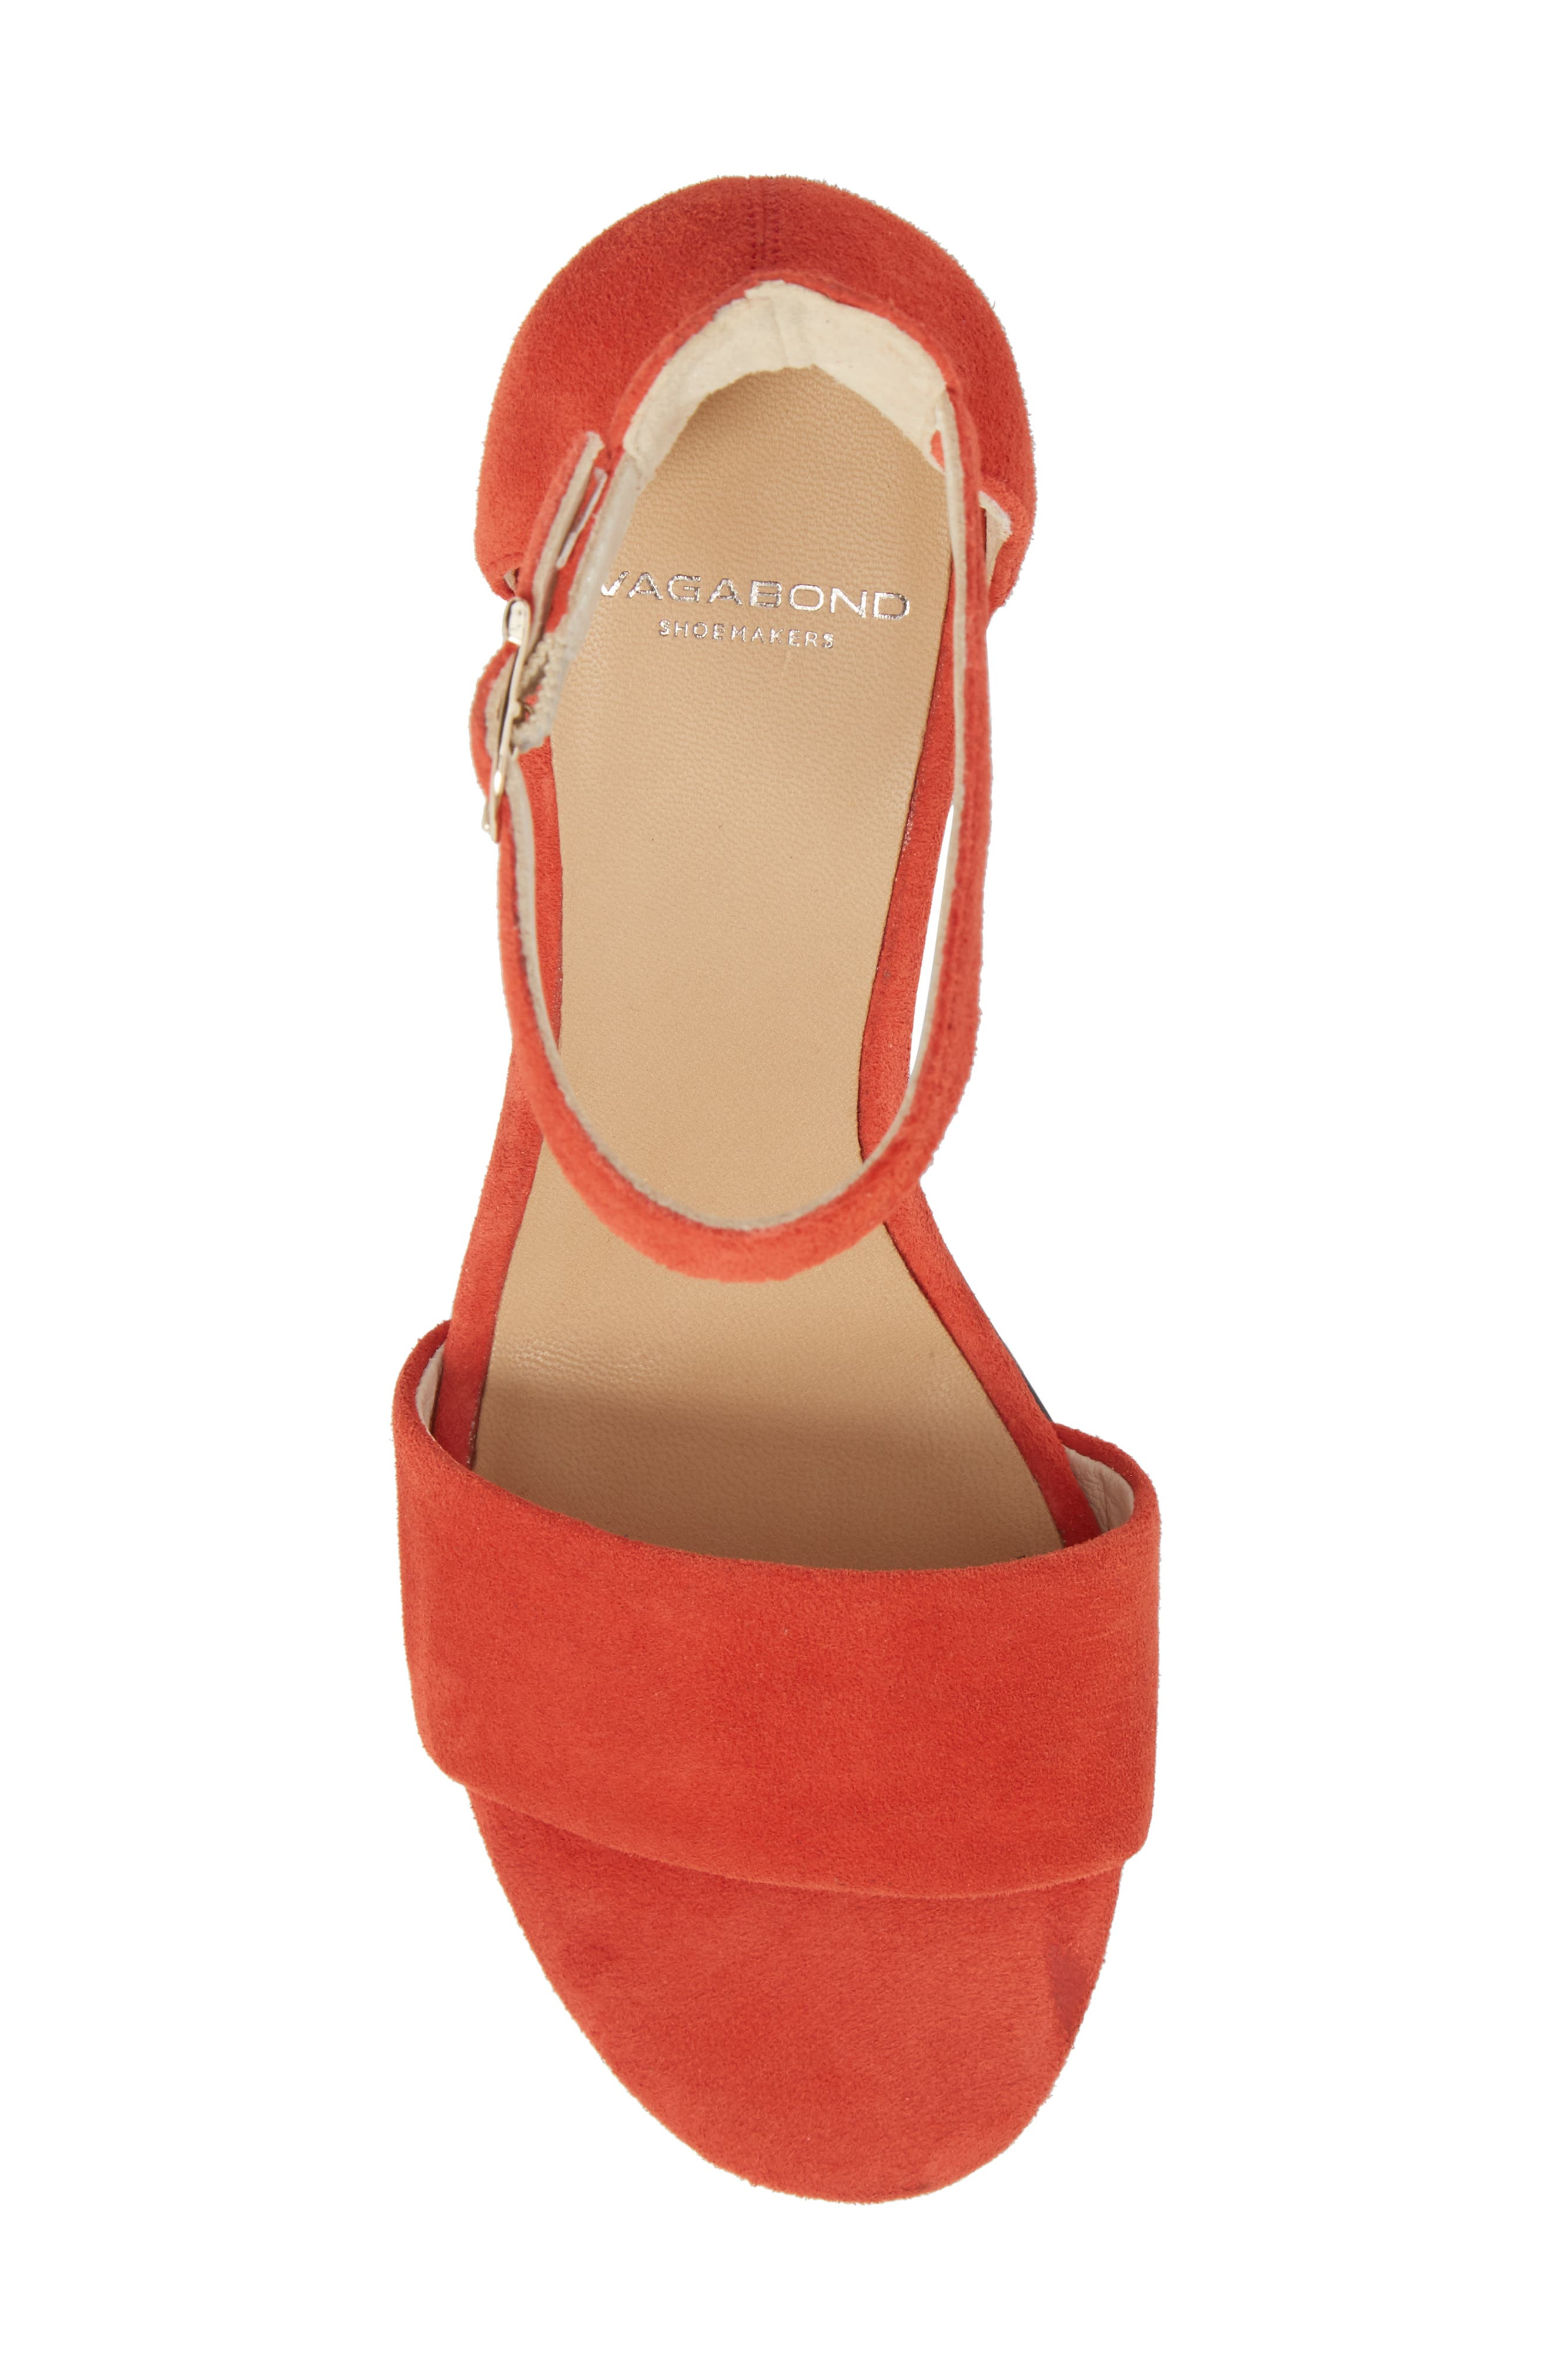 Carol Ankle Strap Sandal,                             Alternate thumbnail 5, color,                             Coral Suede